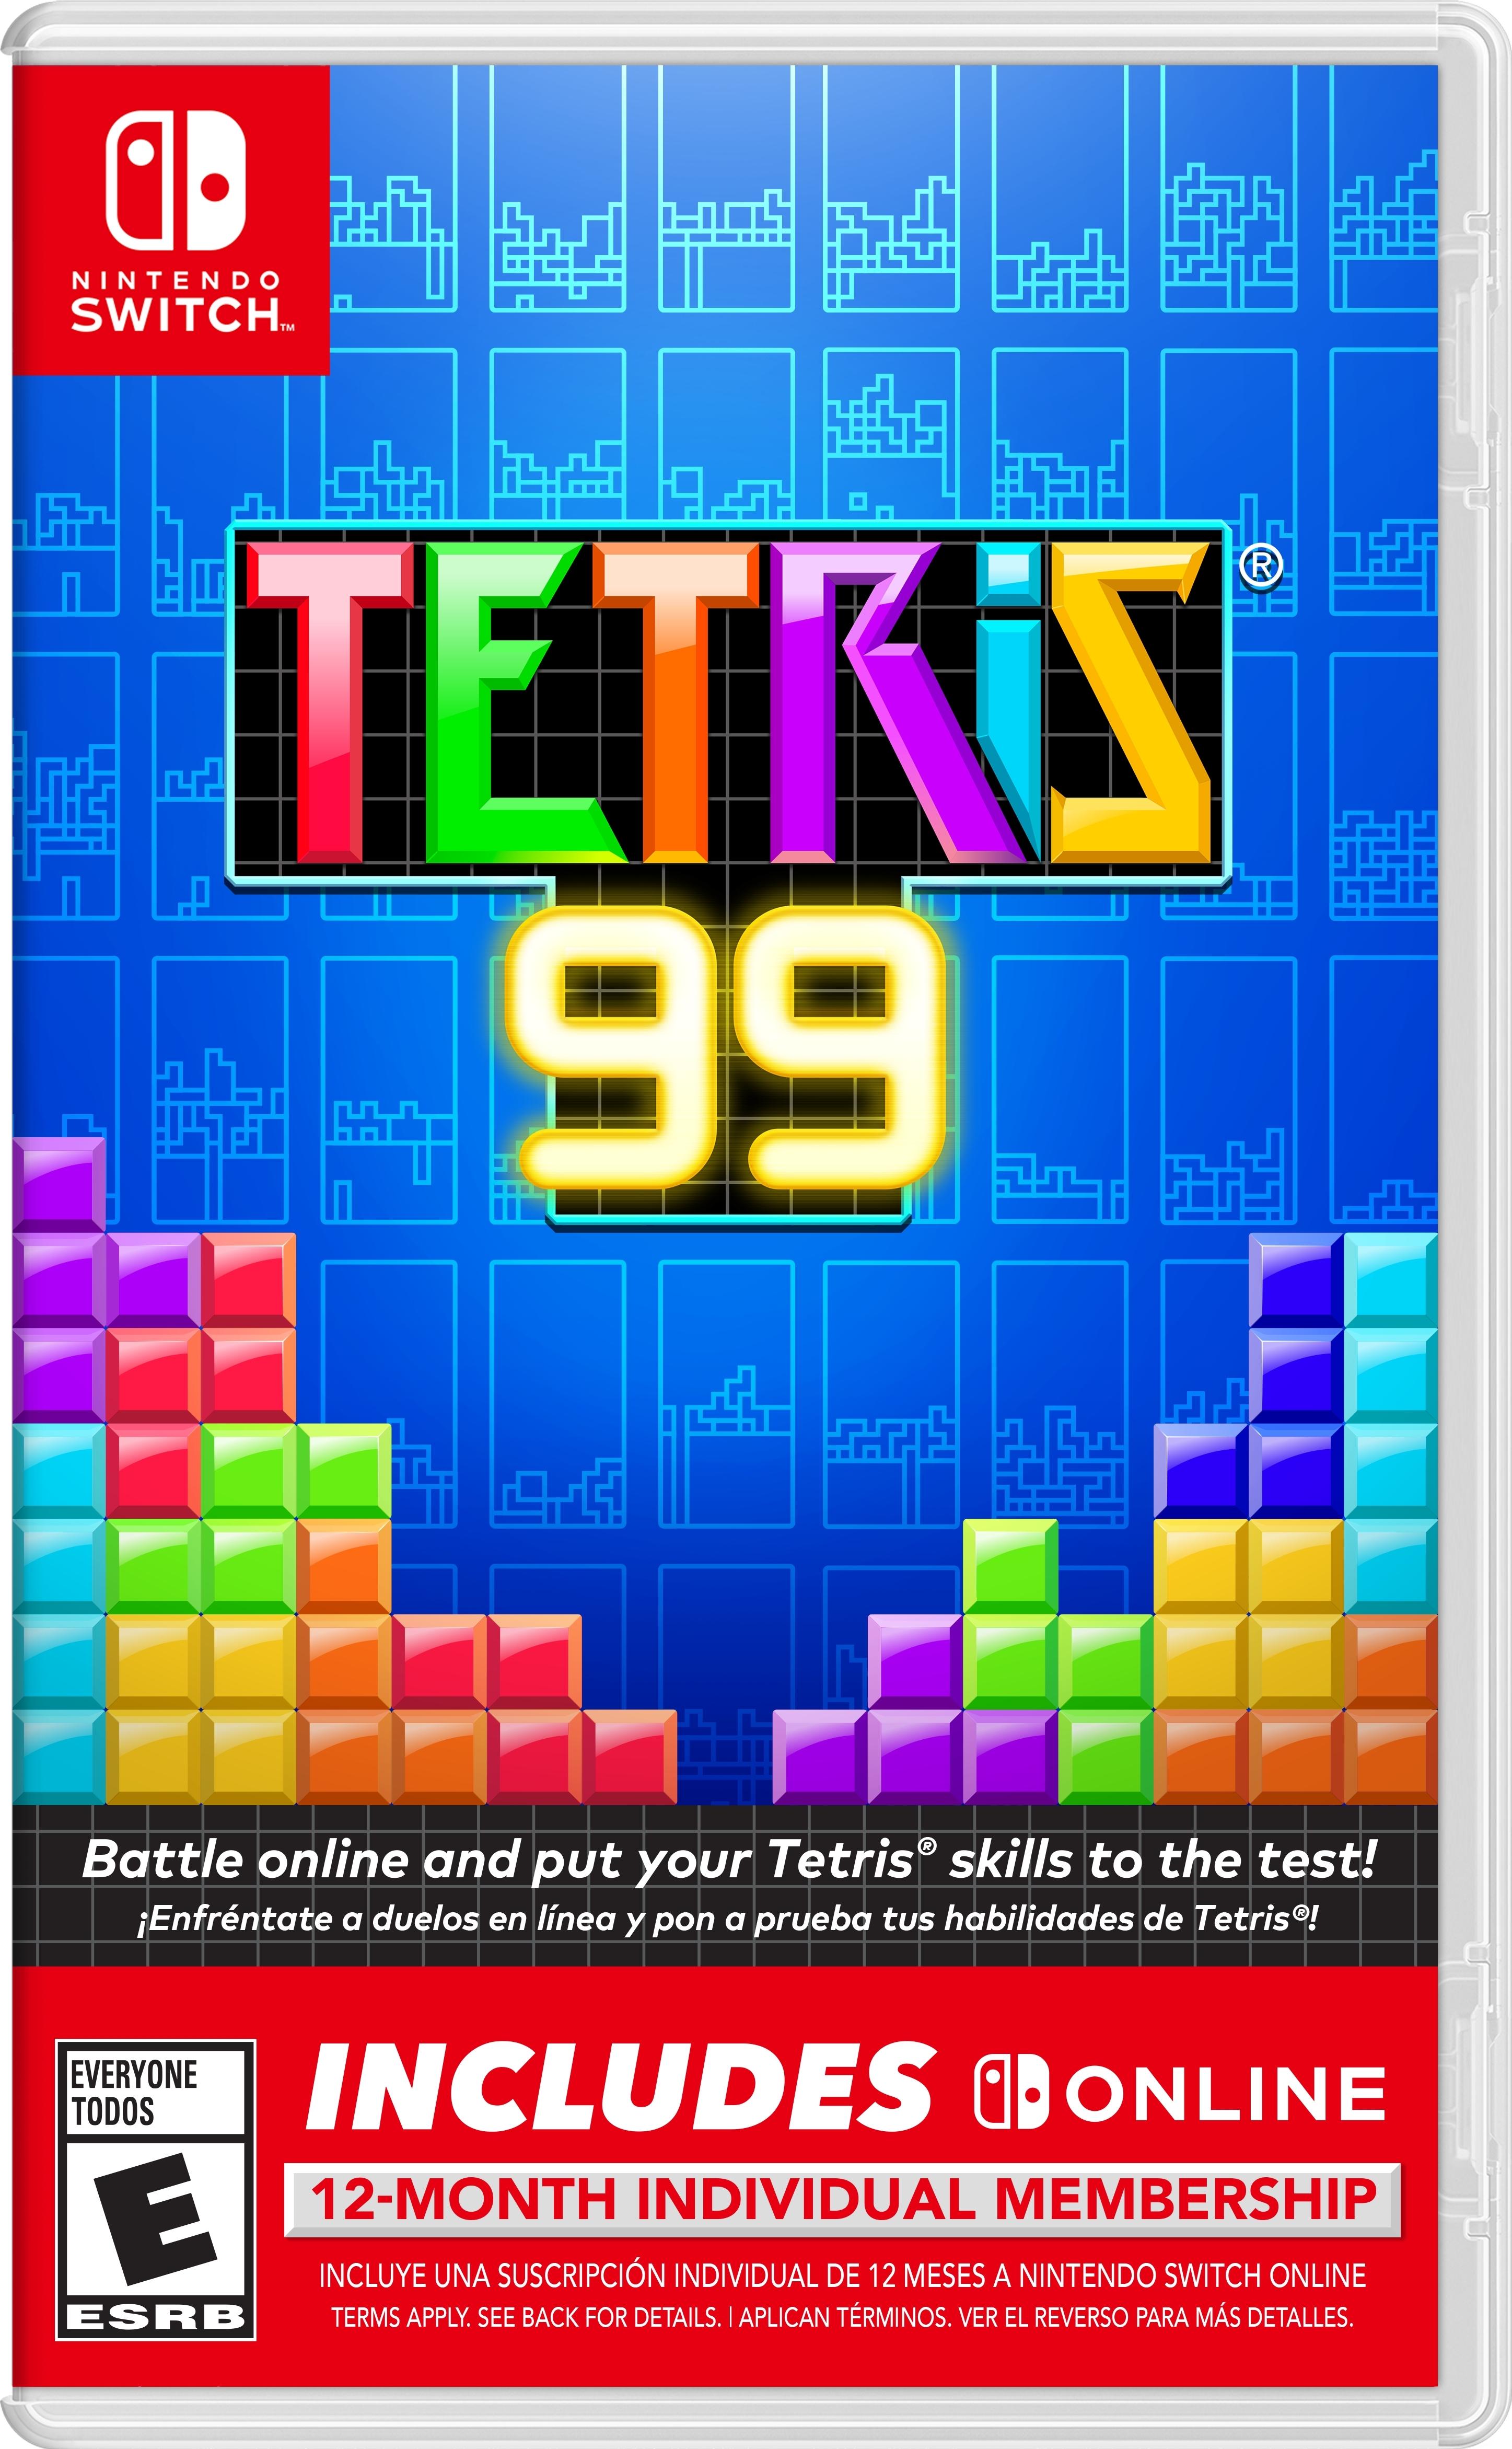 Nintendo News: New Bundle Featuring Tetris® 99 and a 12